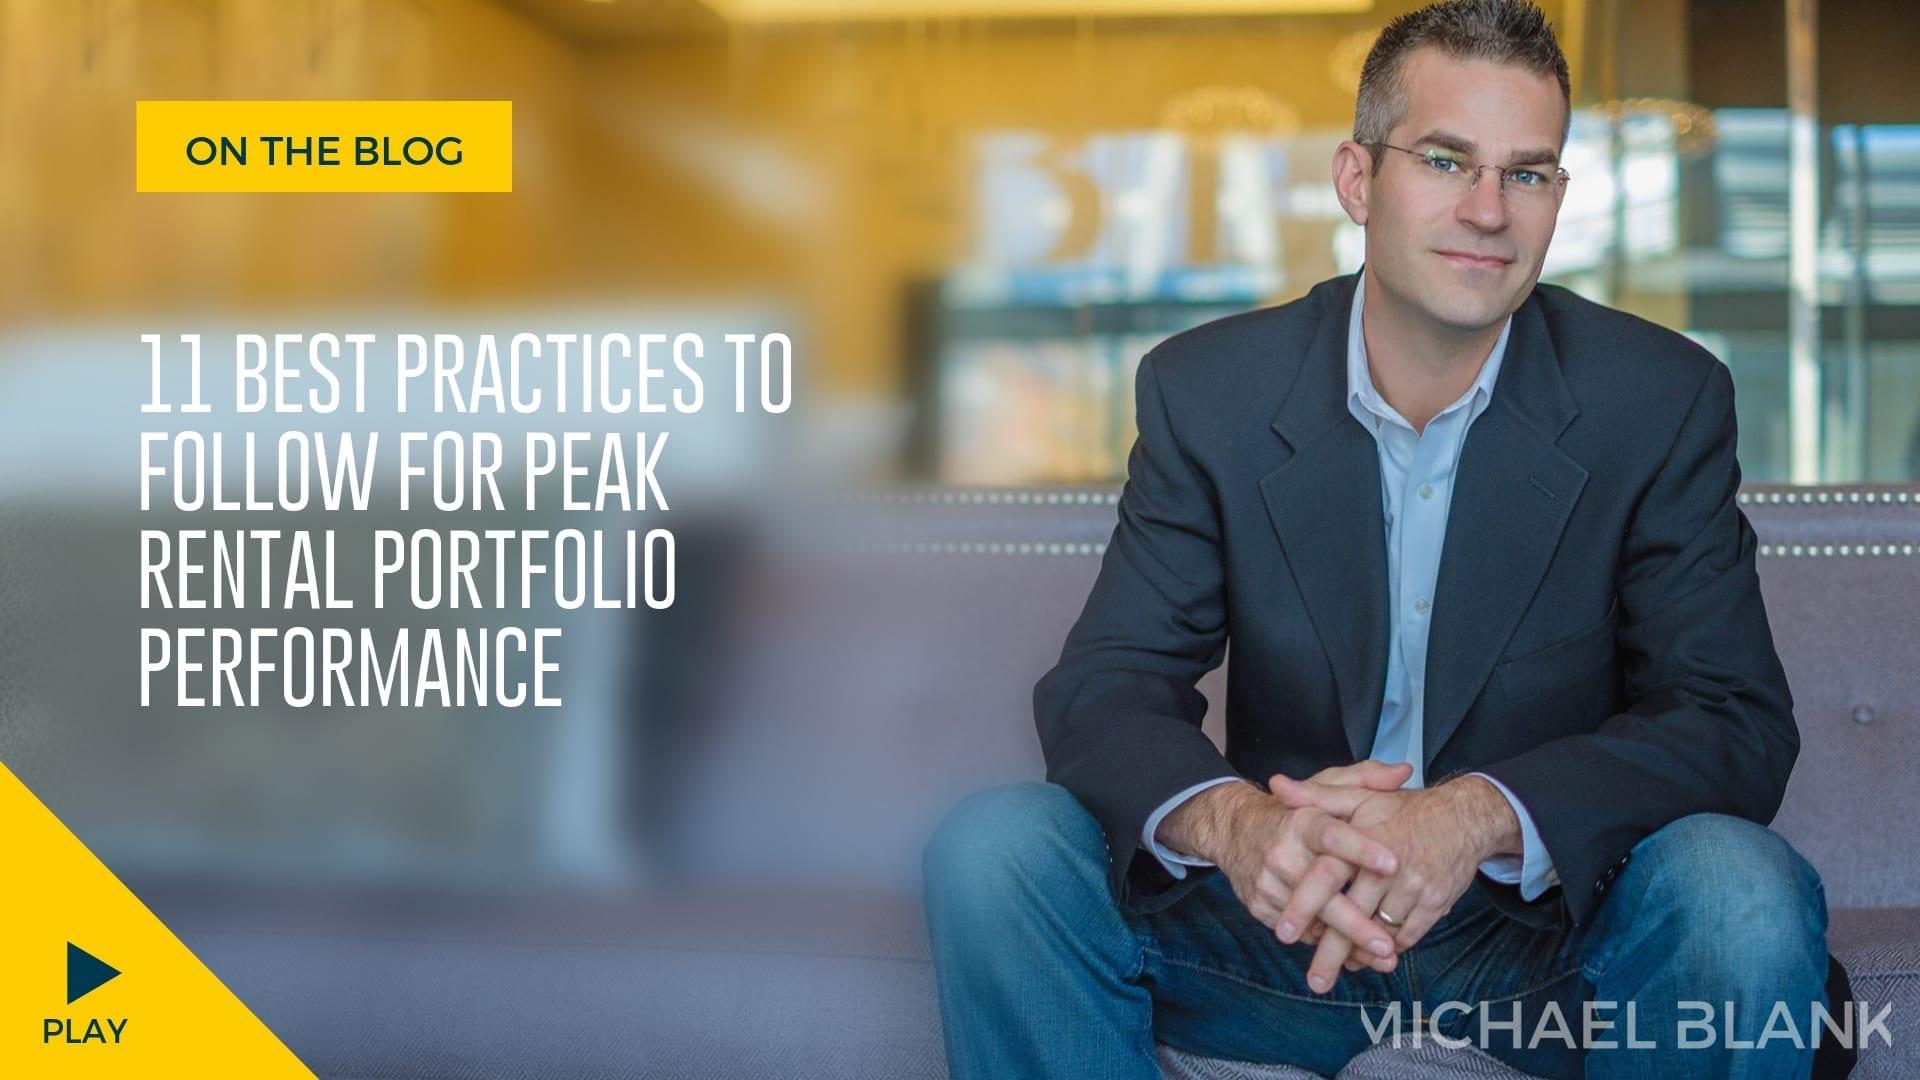 11 Best Practices to Follow for Peak Rental Portfolio Performance